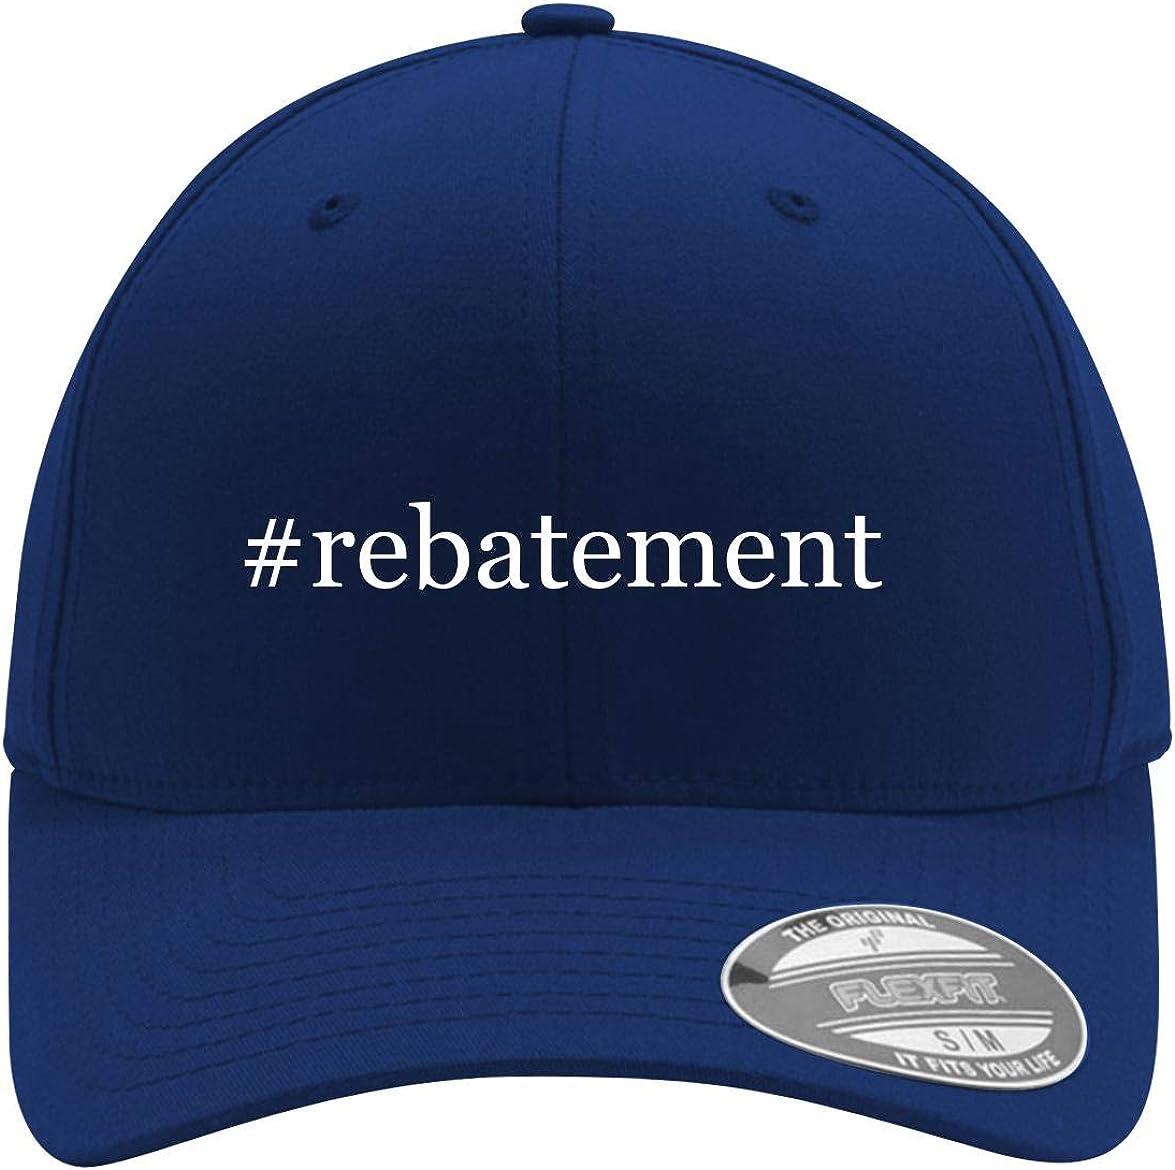 #rebatement - Adult Men's Hashtag Flexfit Baseball Hat Cap